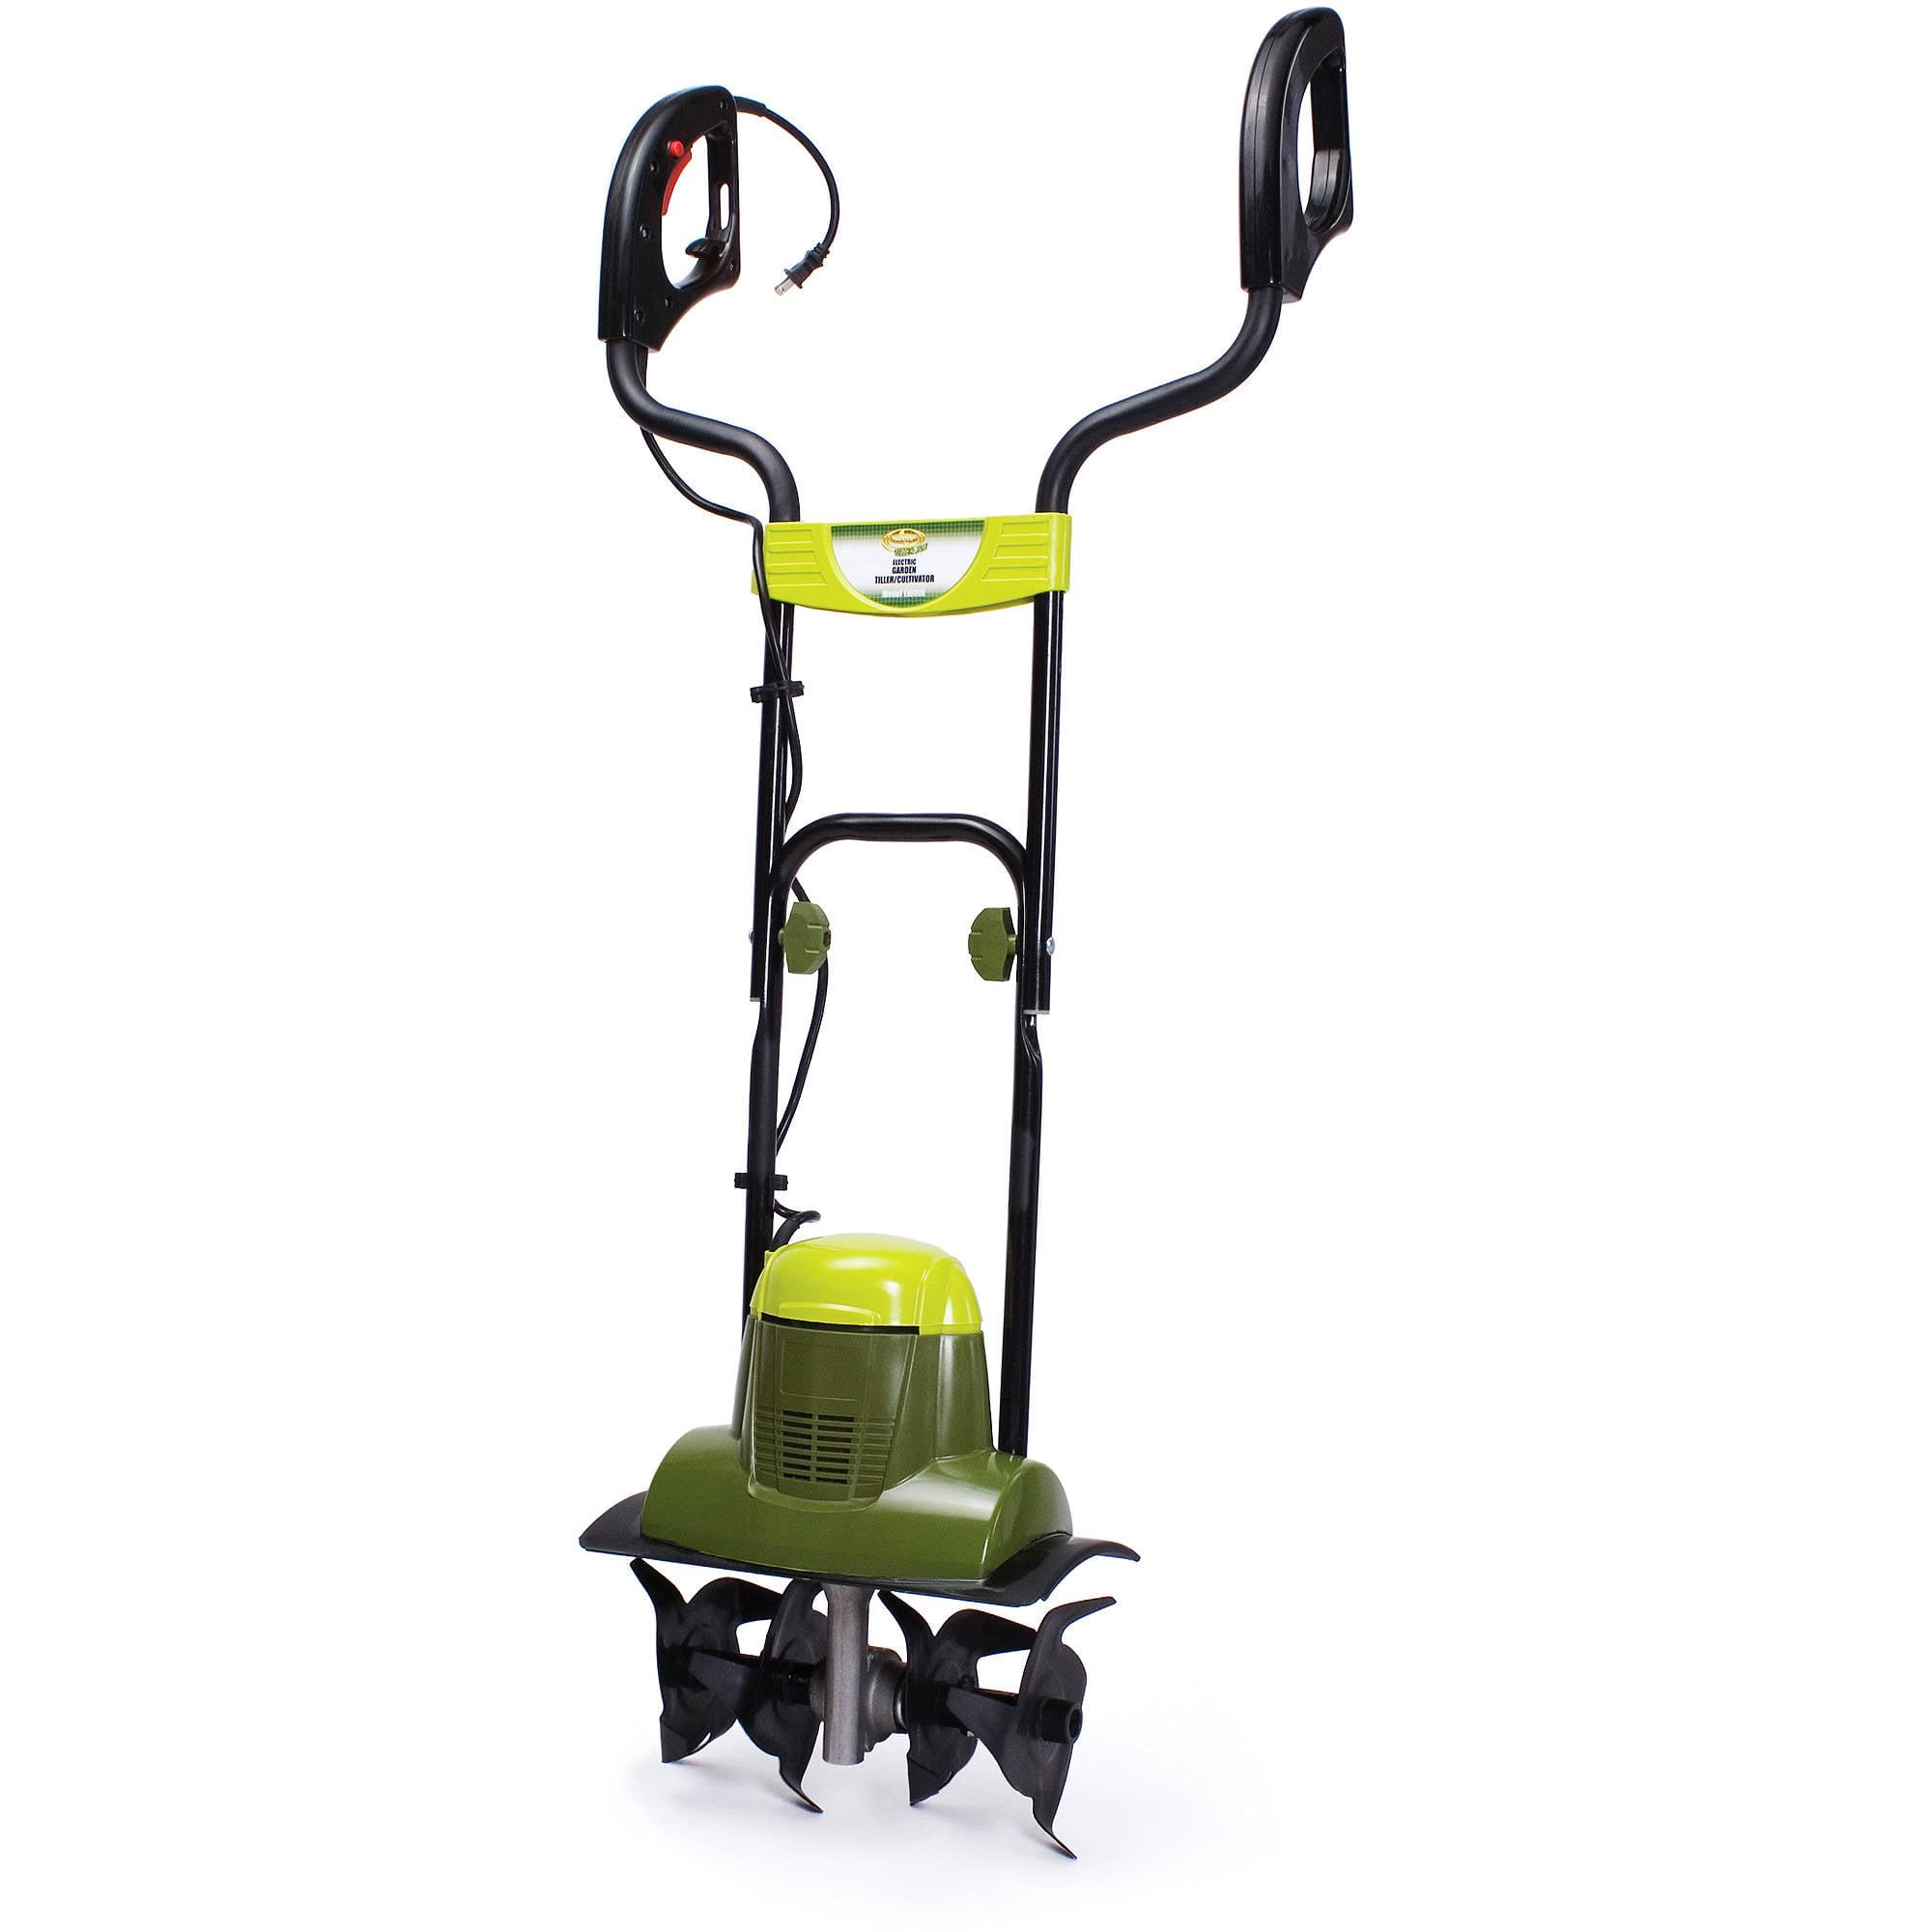 Sun Joe Tiller Joe 6.5-Amp Electric Garden Tiller/Cultivator – TJ600E